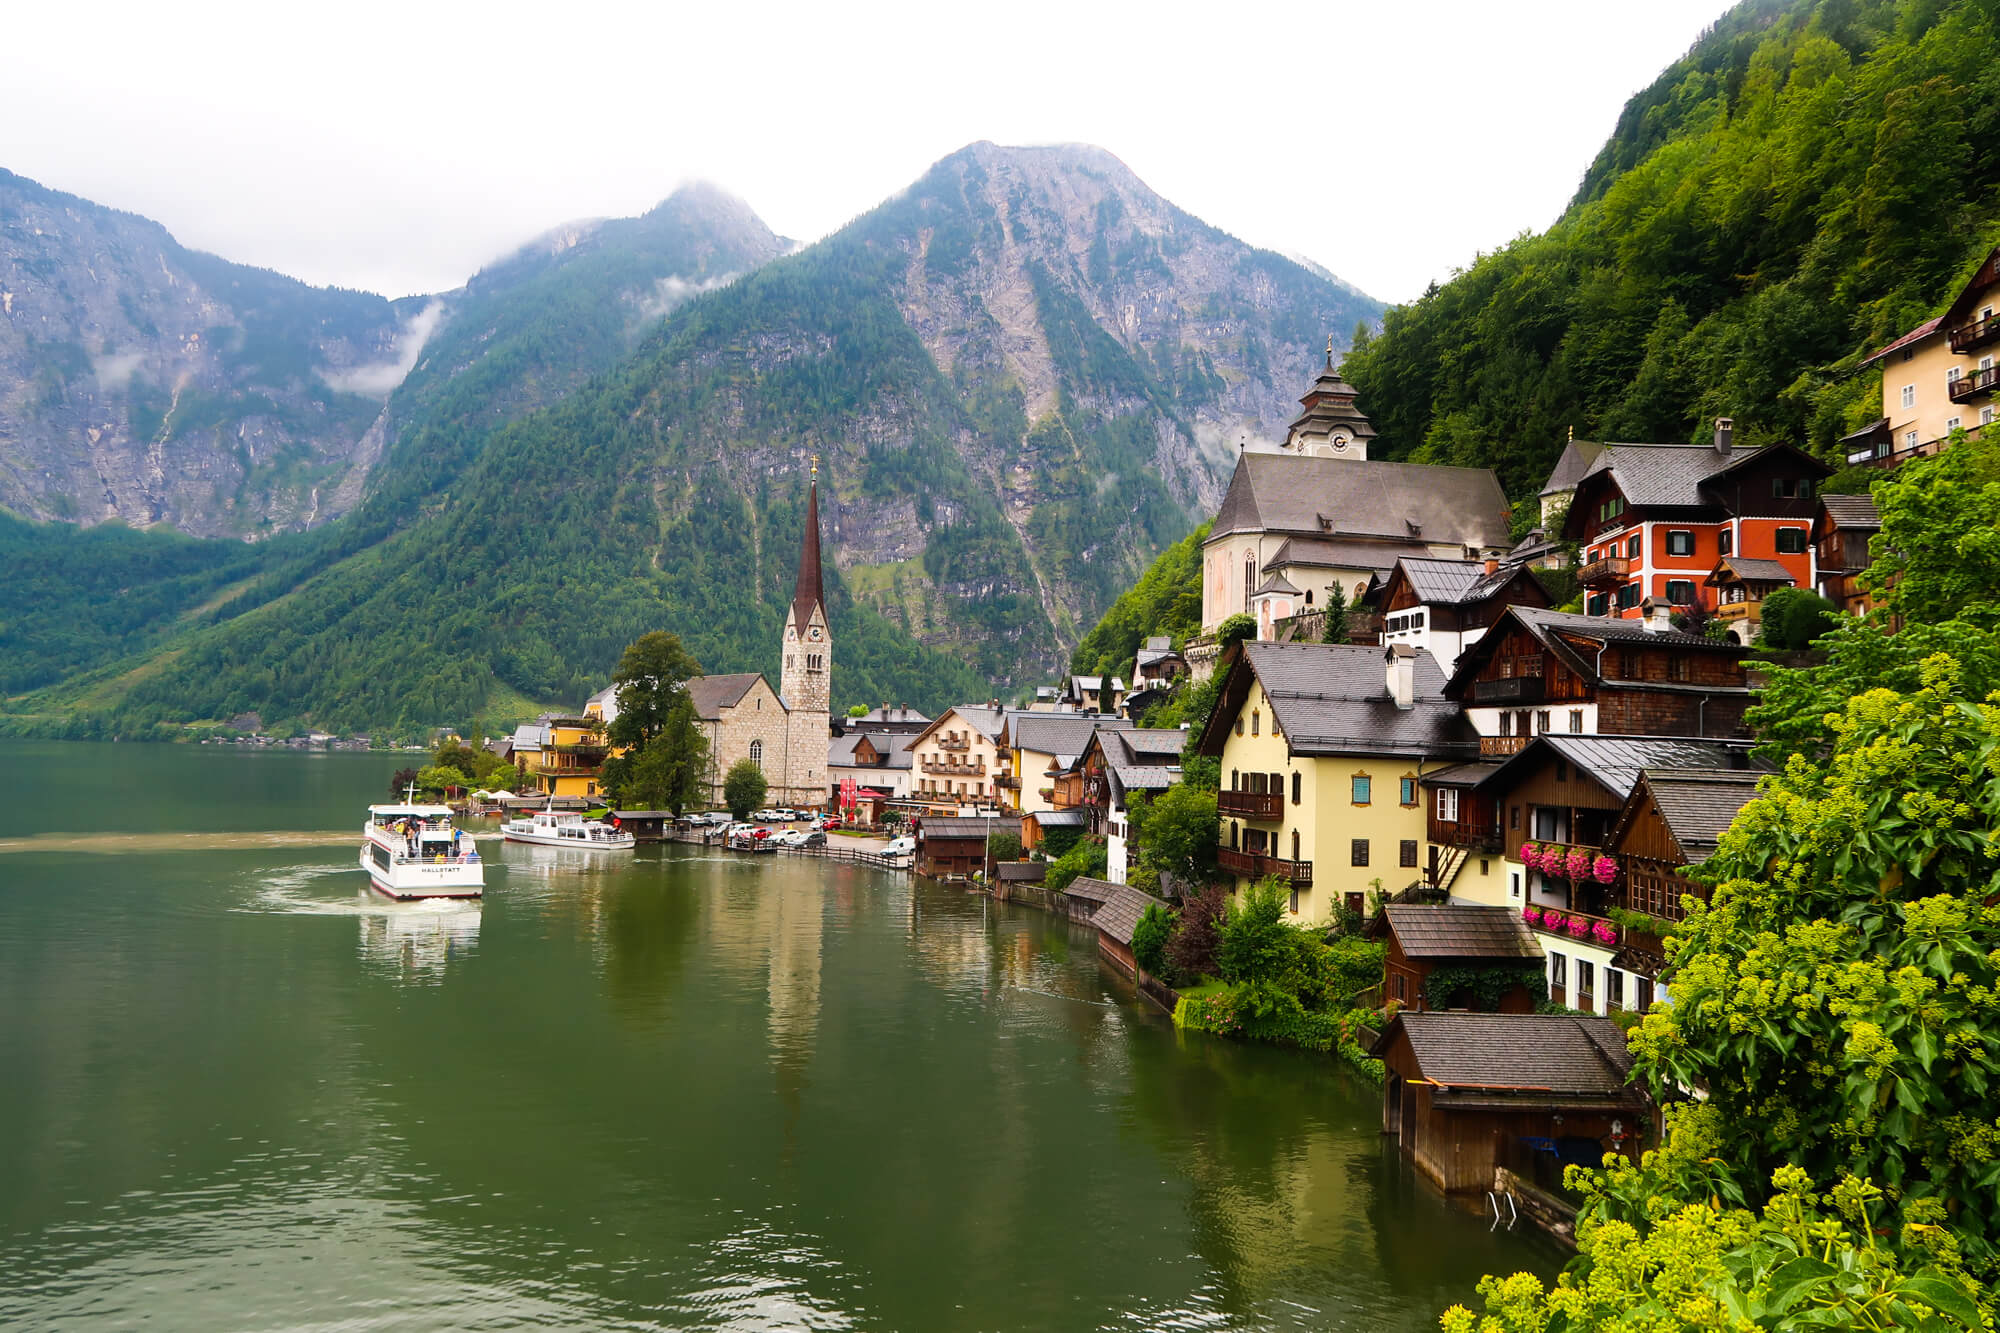 Travel to Hallstatt with travel blogger The Globetrotting Detective